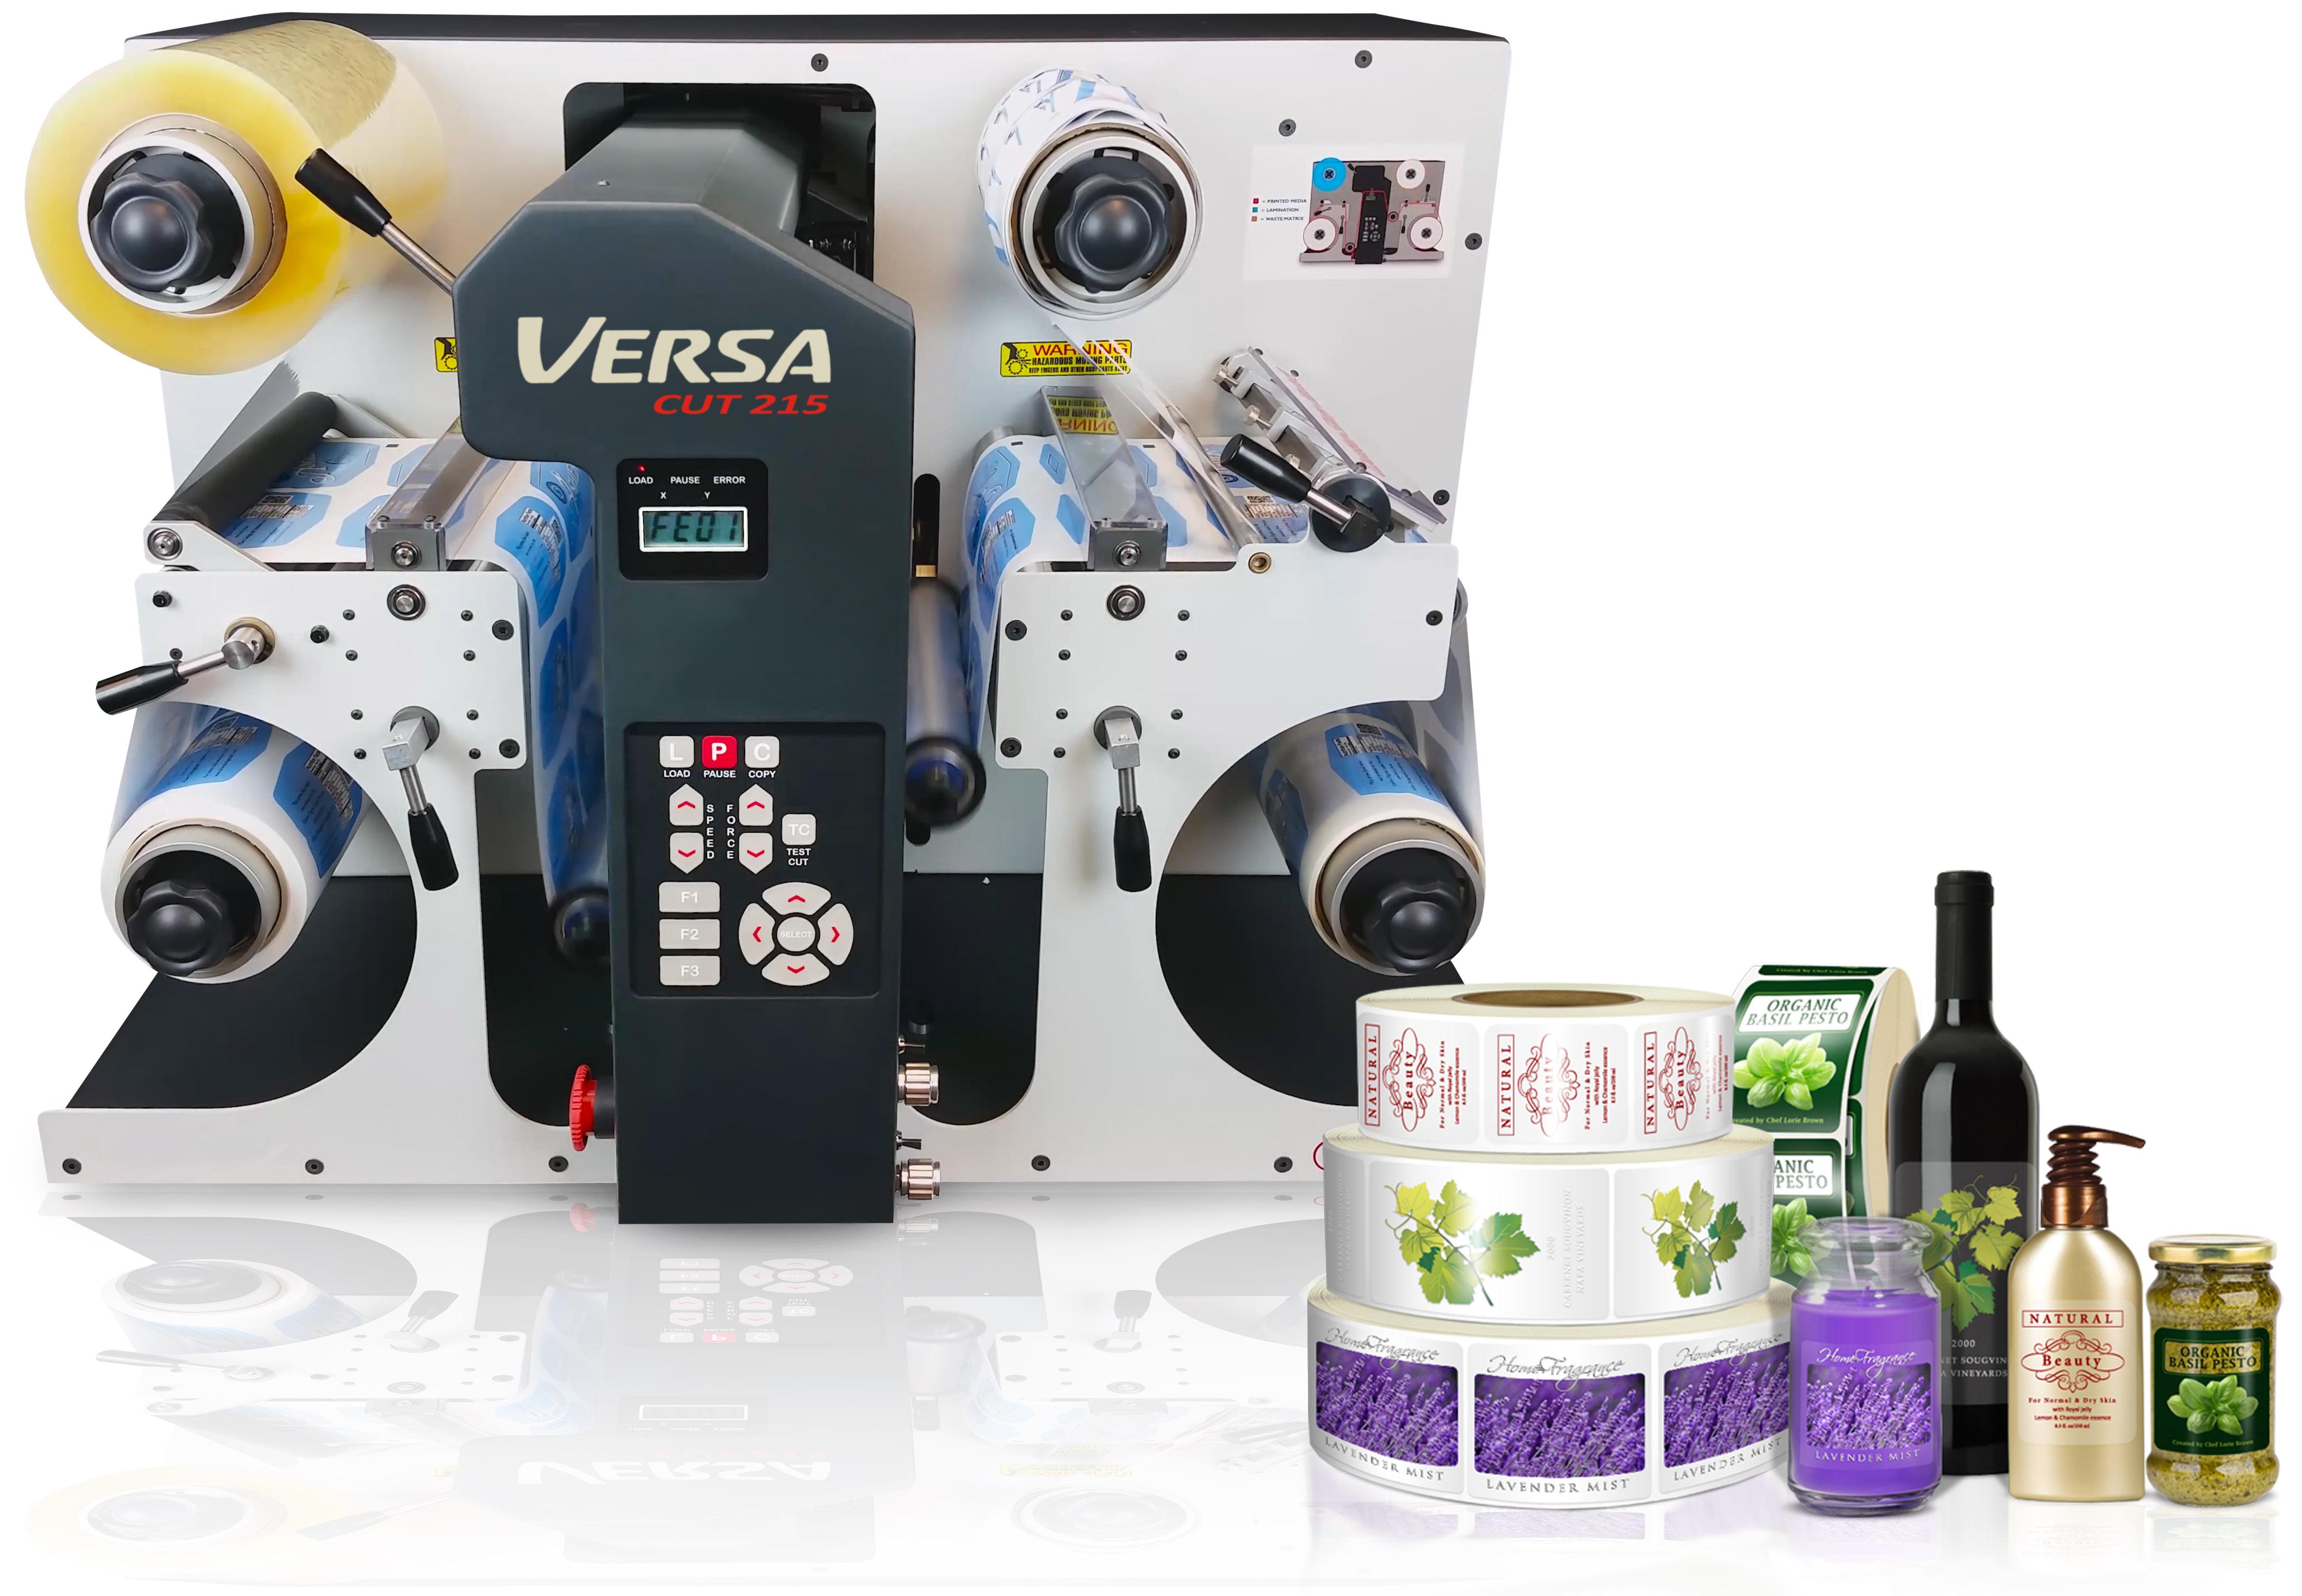 VersaCut 215 - Sistema de Acabamento Digital para Rótulos e Etiquetas Autoadesivas